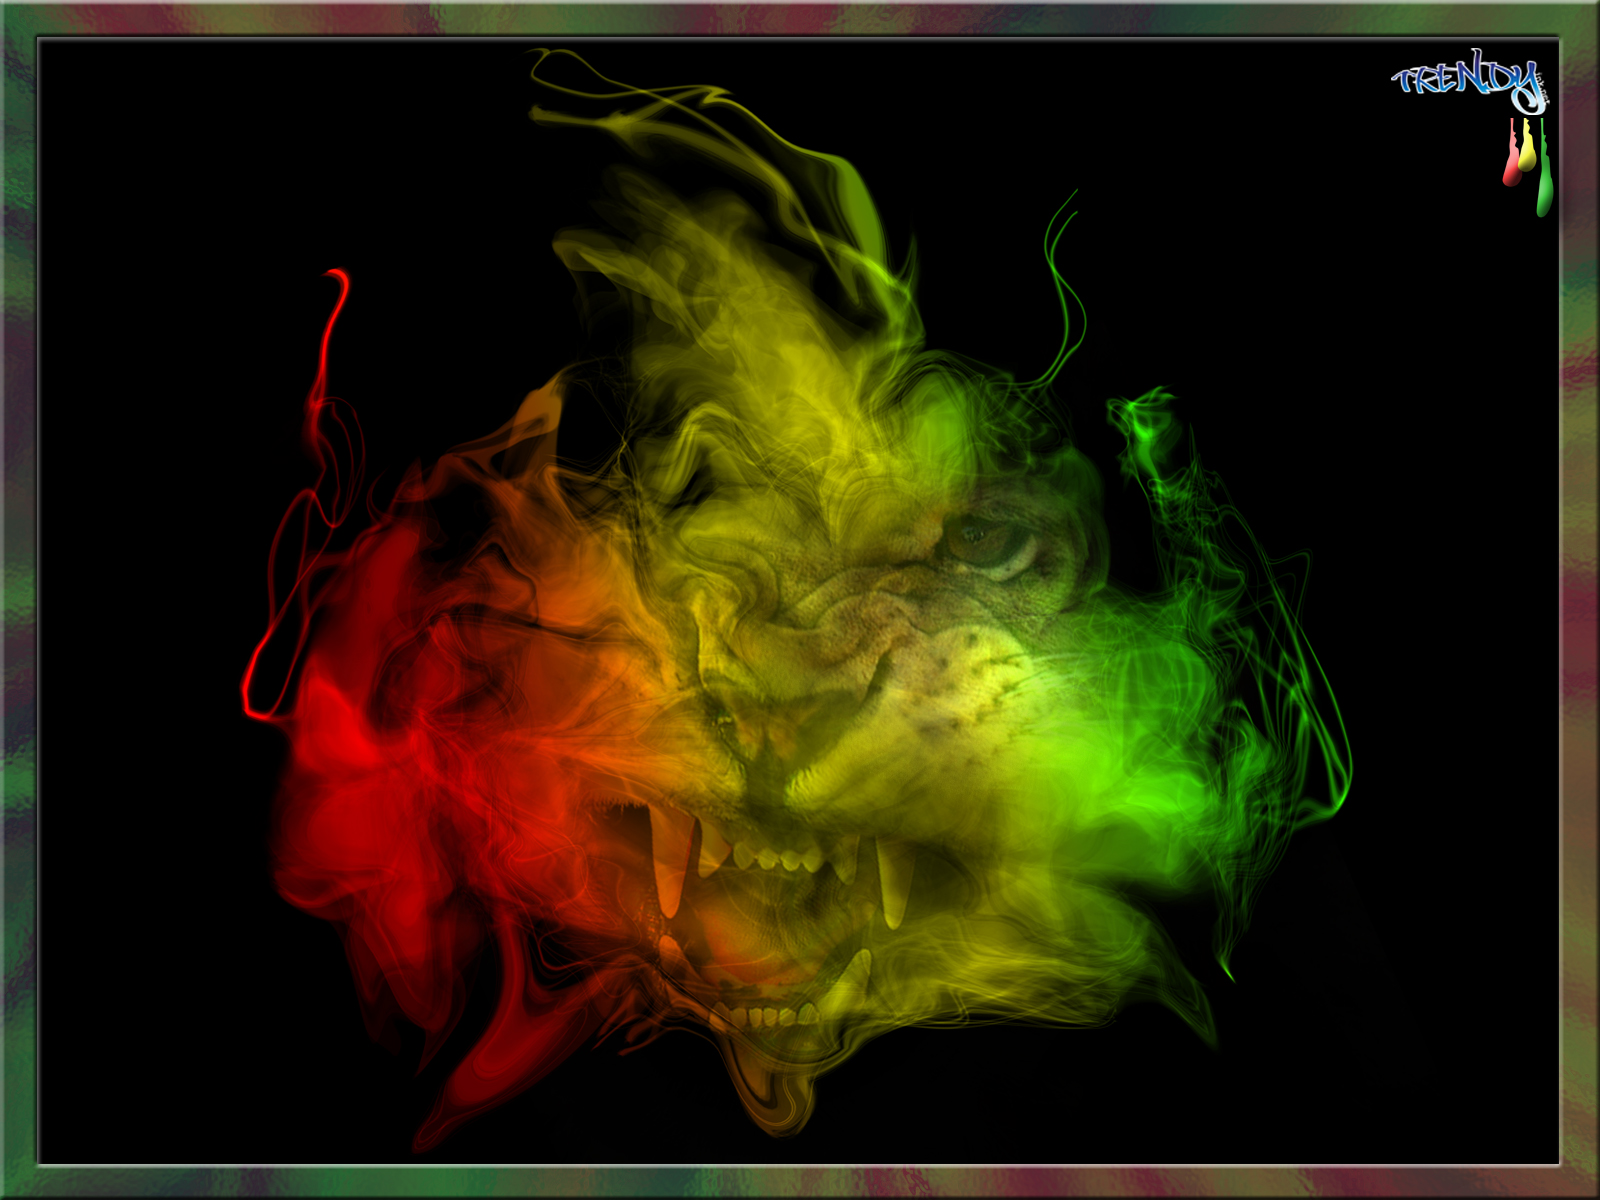 My Top Collection Rasta lion wallpaper 2 1600x1200